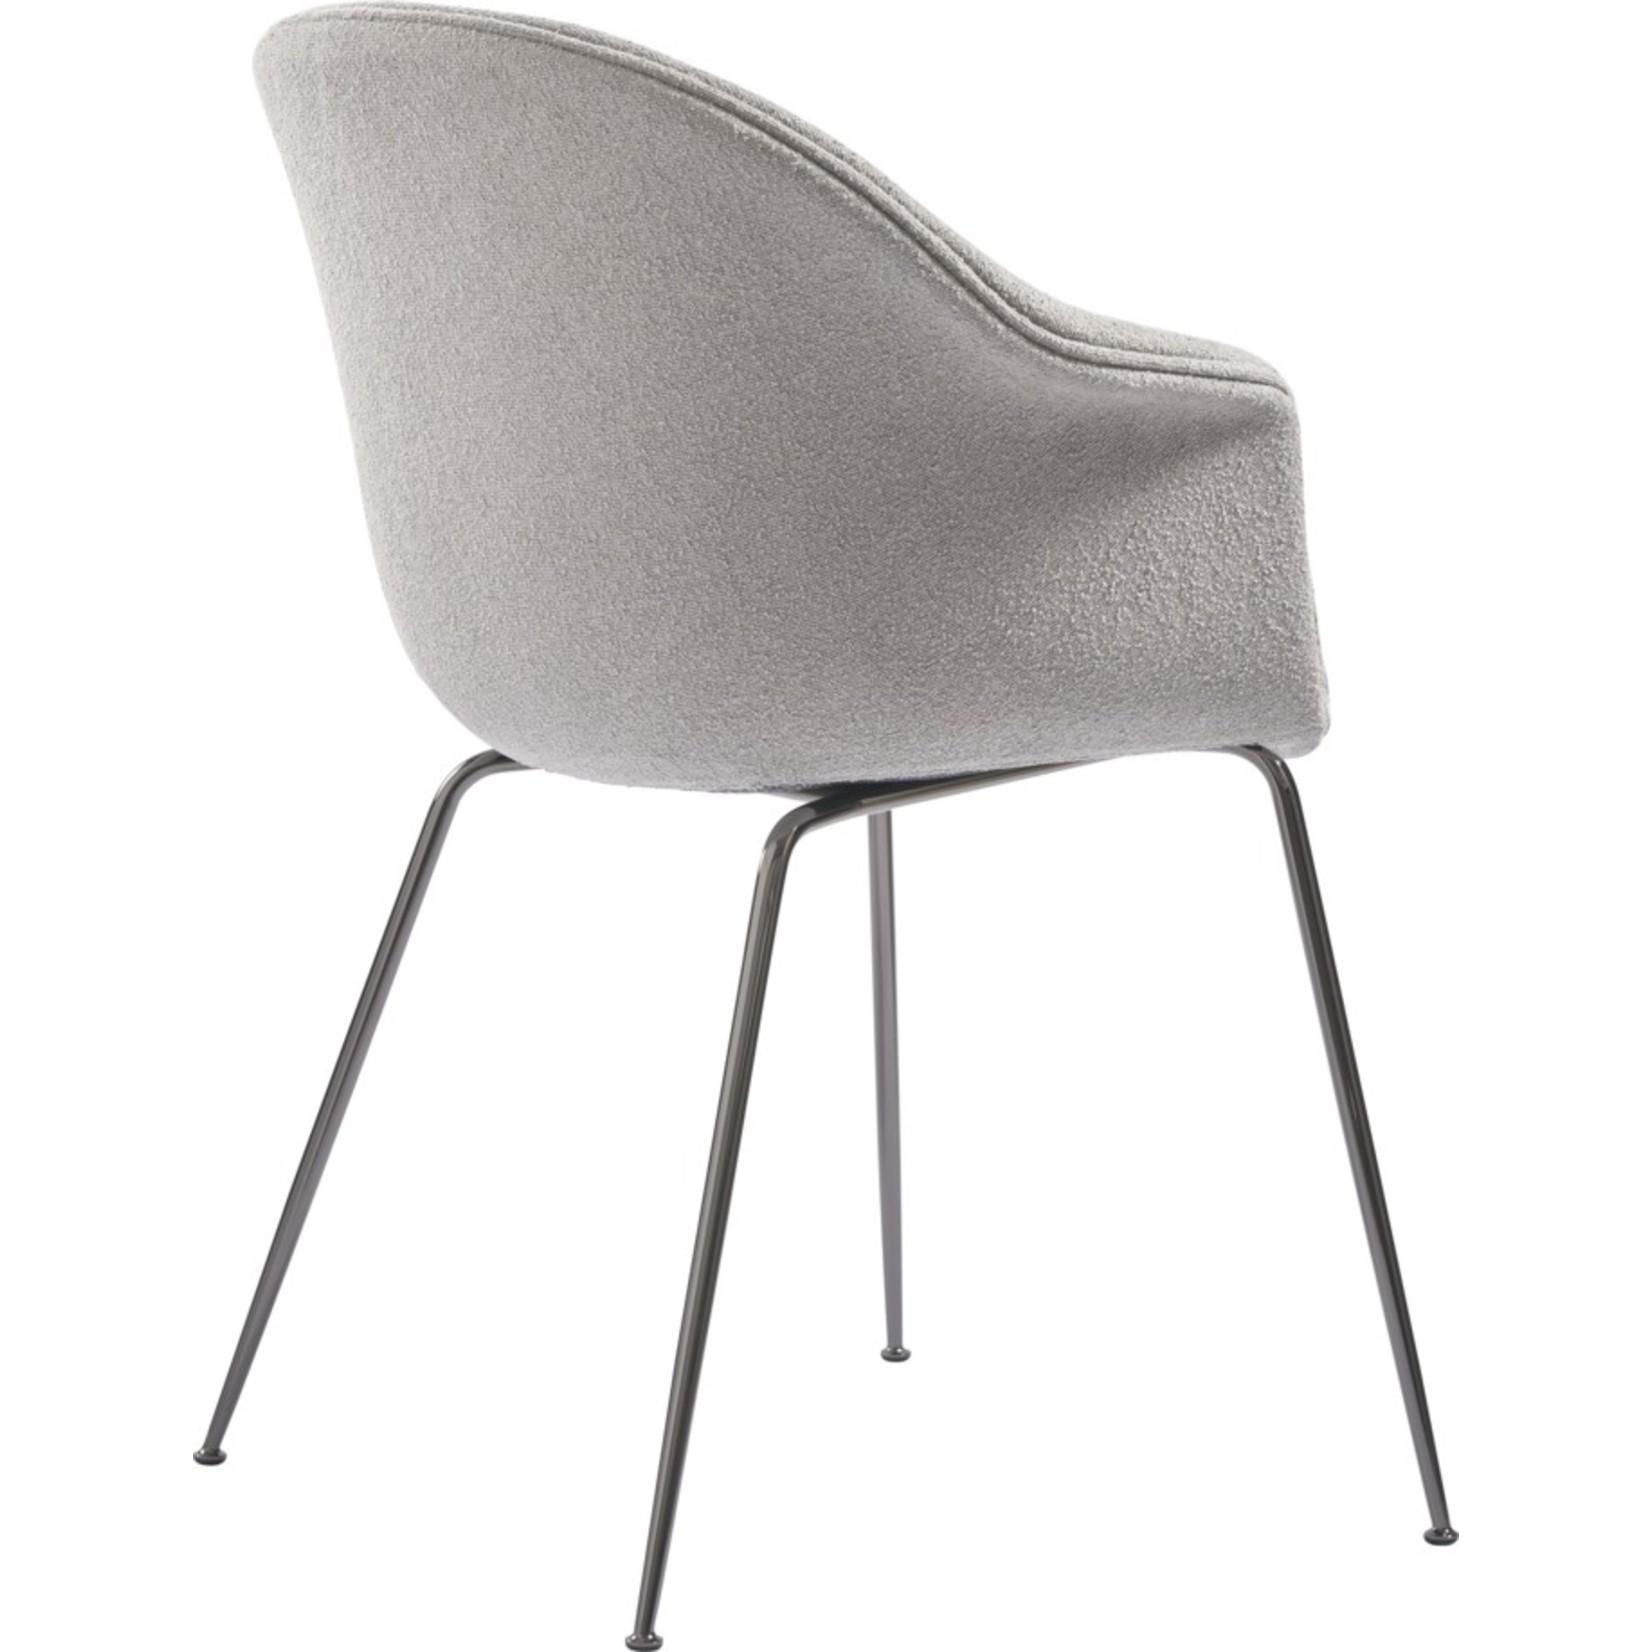 Gubi Bat Dining Chair   Light Bouclé 008 & Black Chrome Base